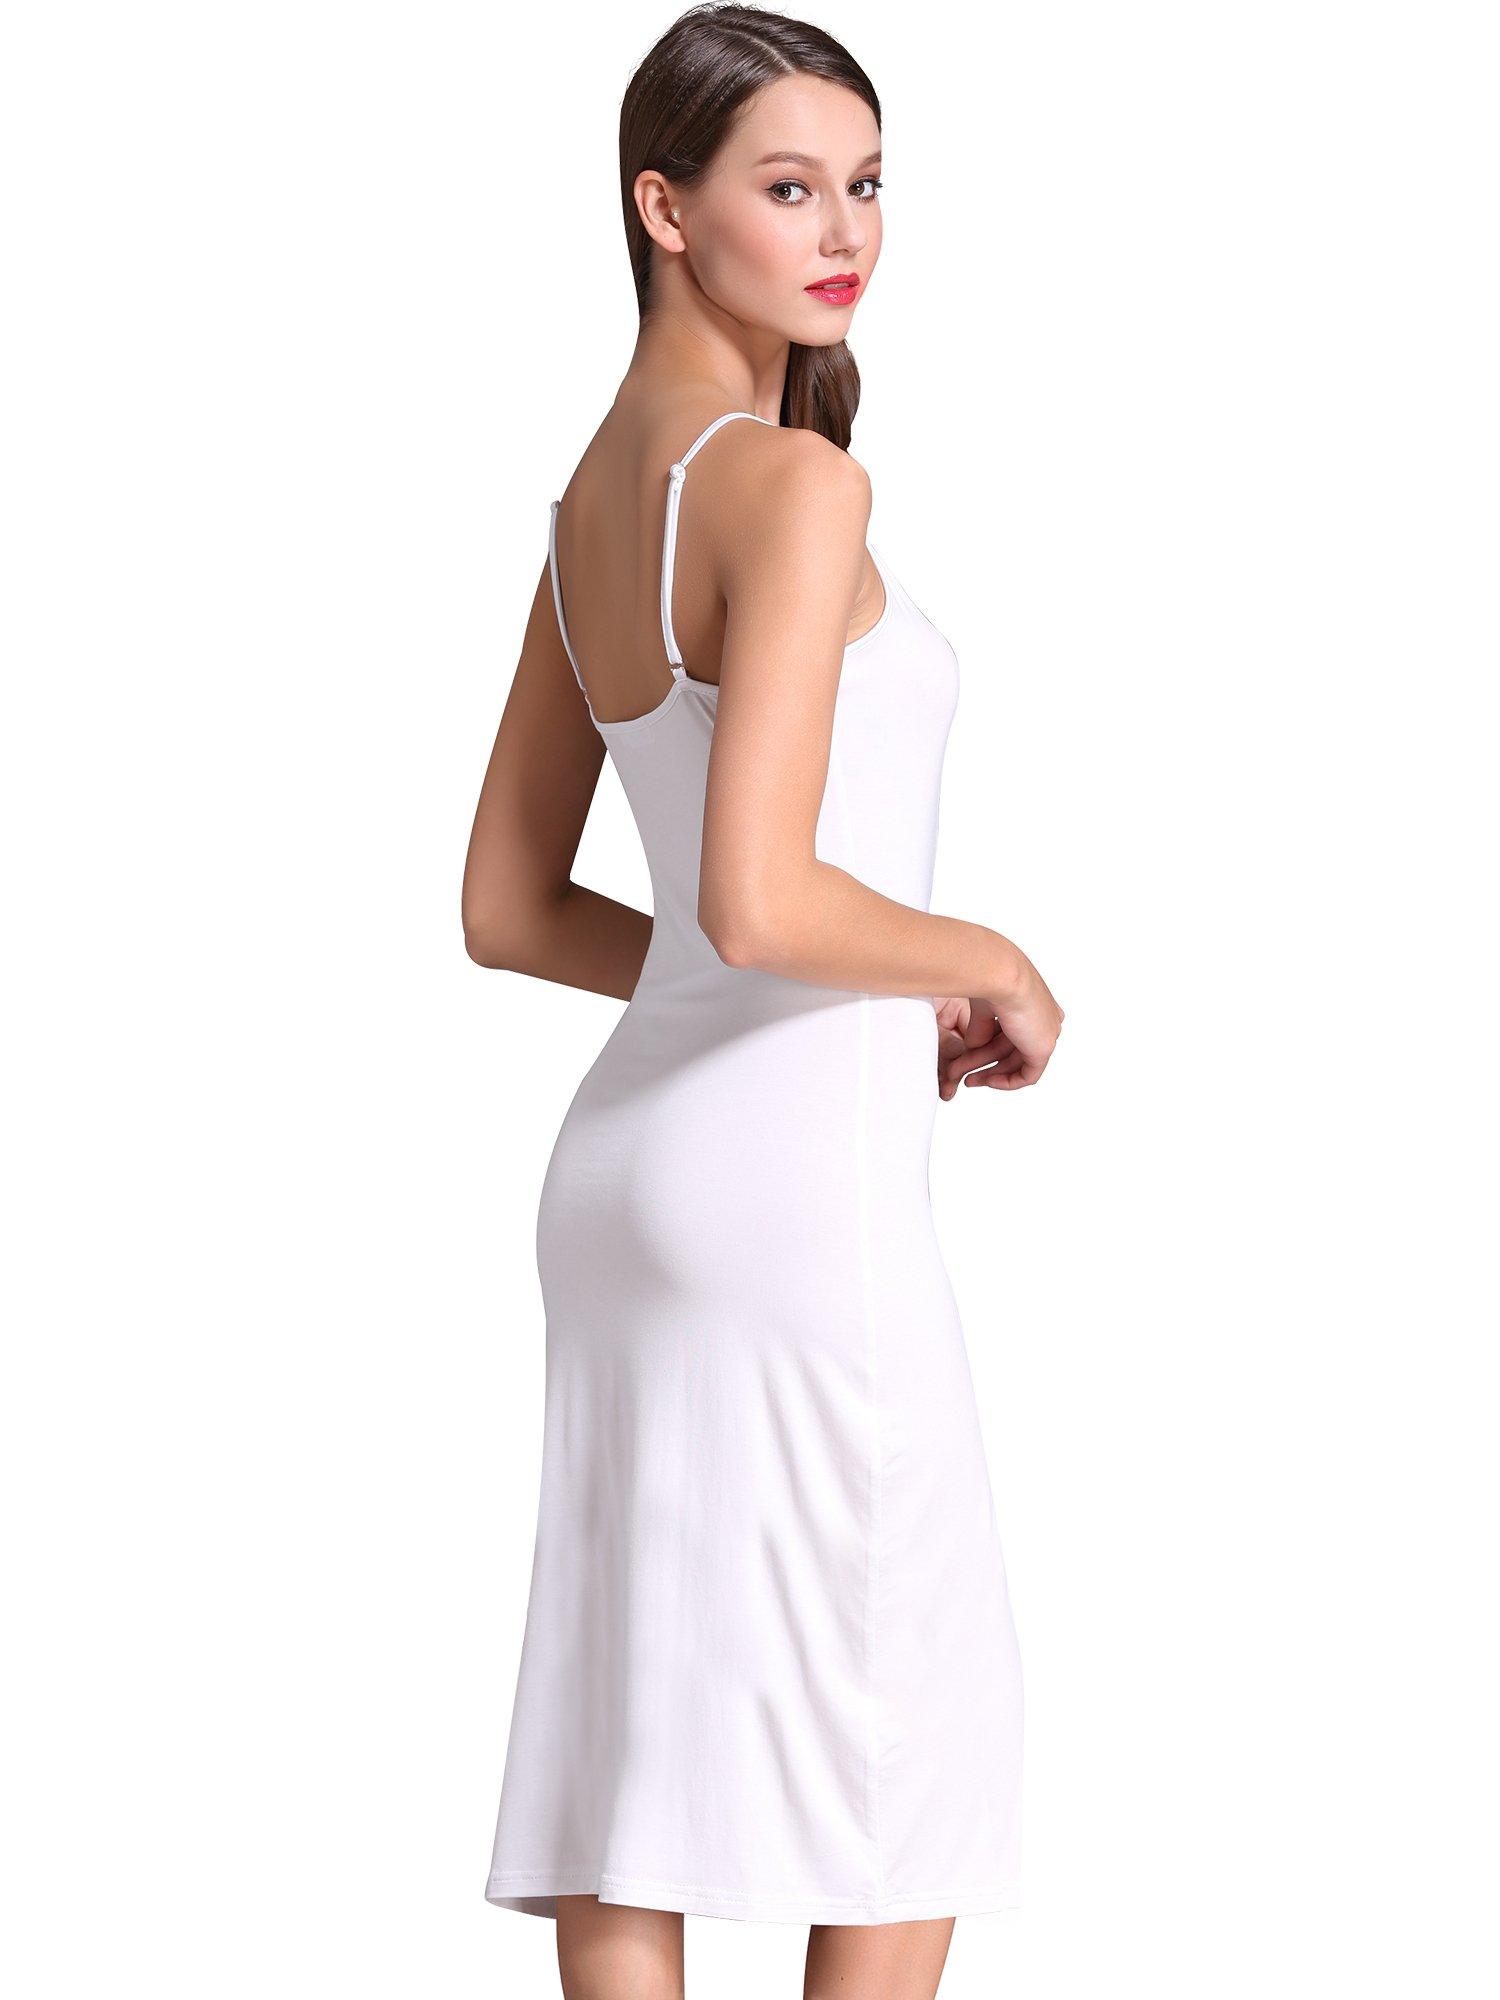 MsBasic Women\'s Adjustable Spaghetti Straps Long Cami Slip Dress ...